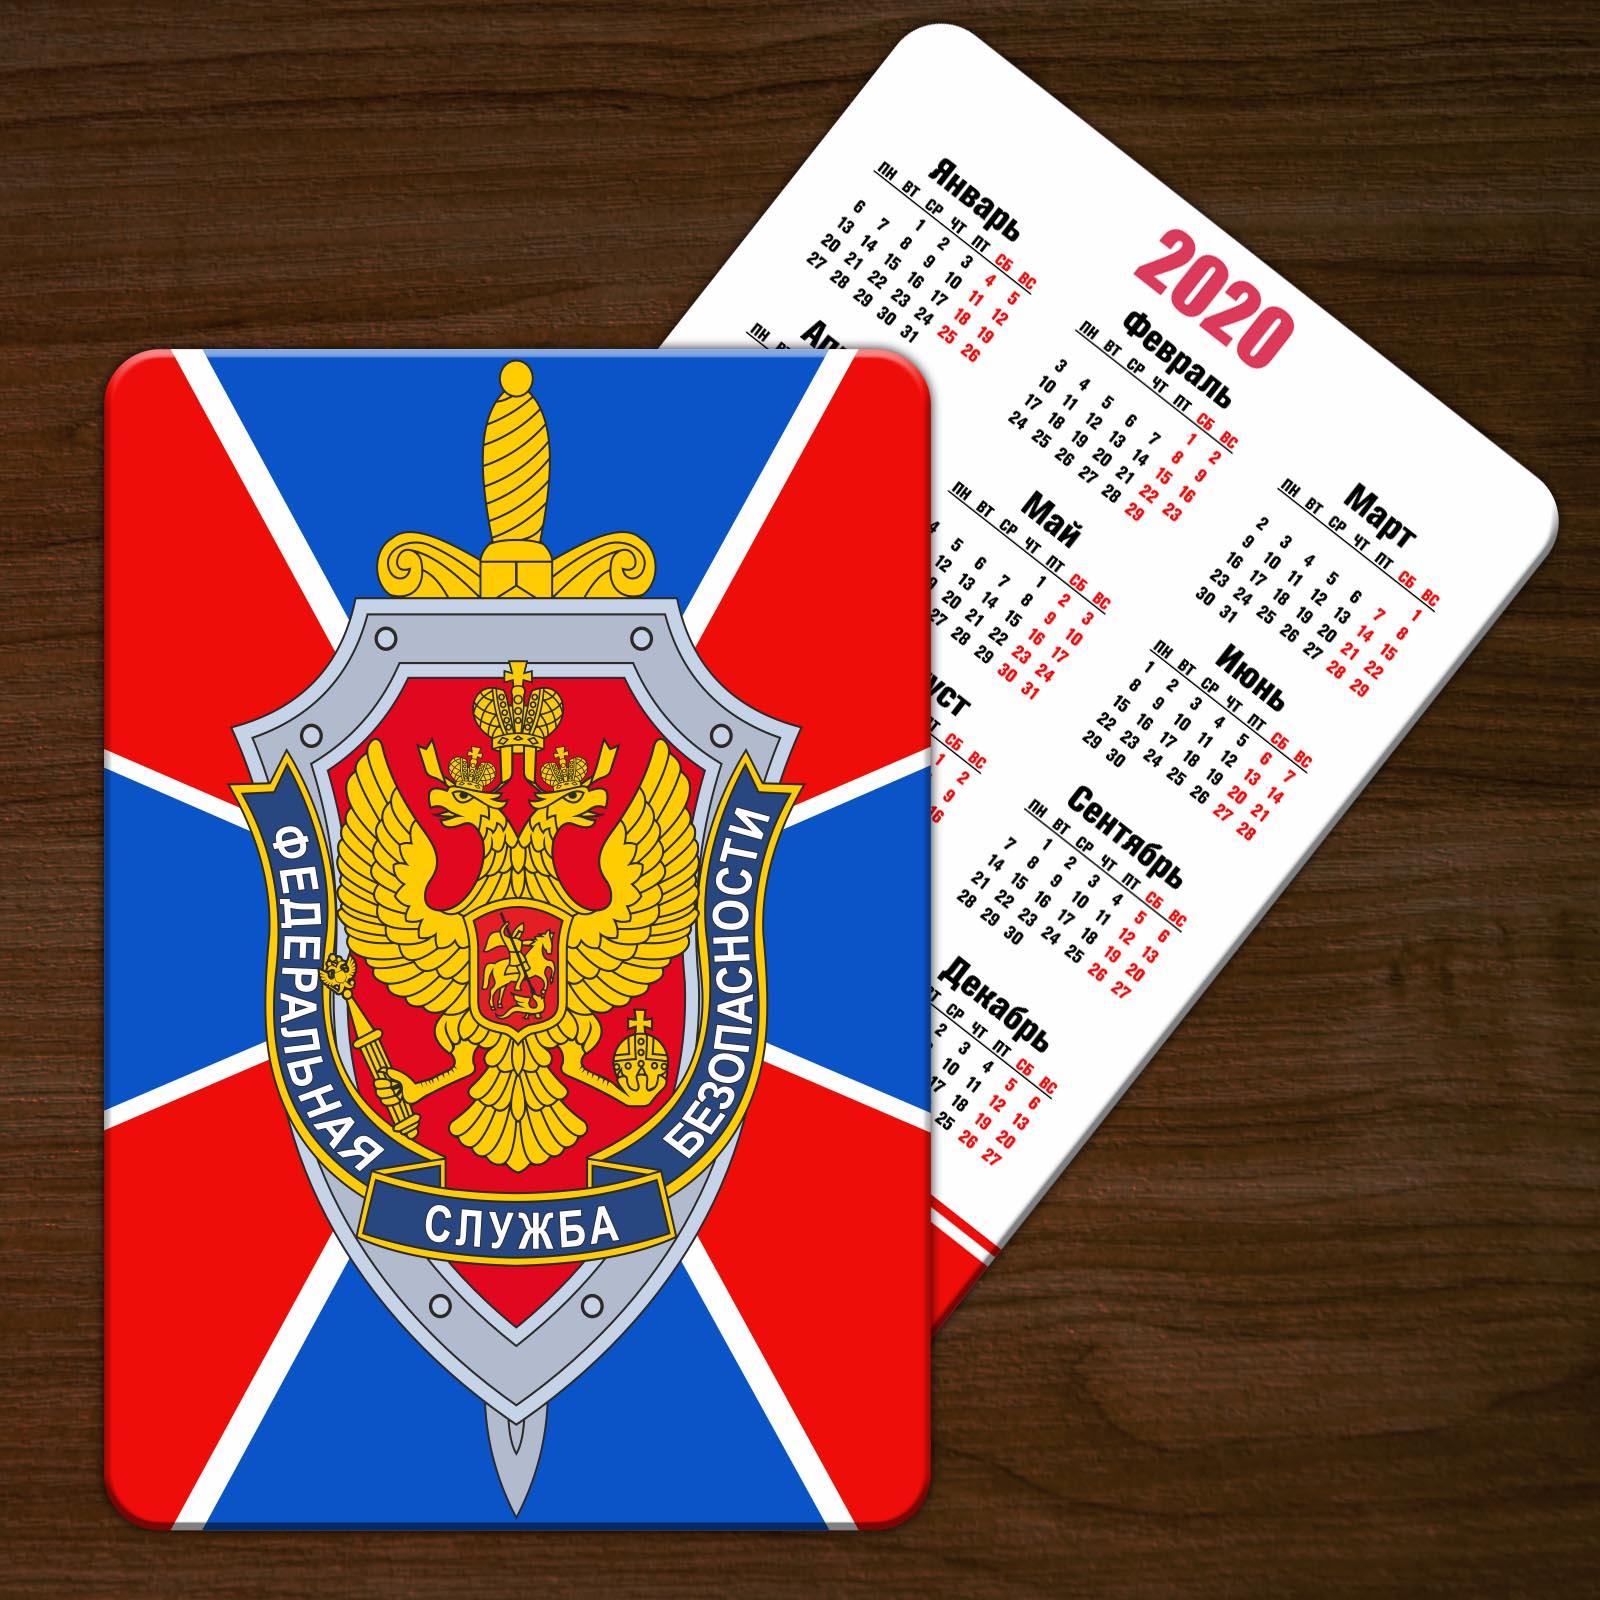 Карманный календарик сотруднику ФСБ (2020 год, 2019 год)